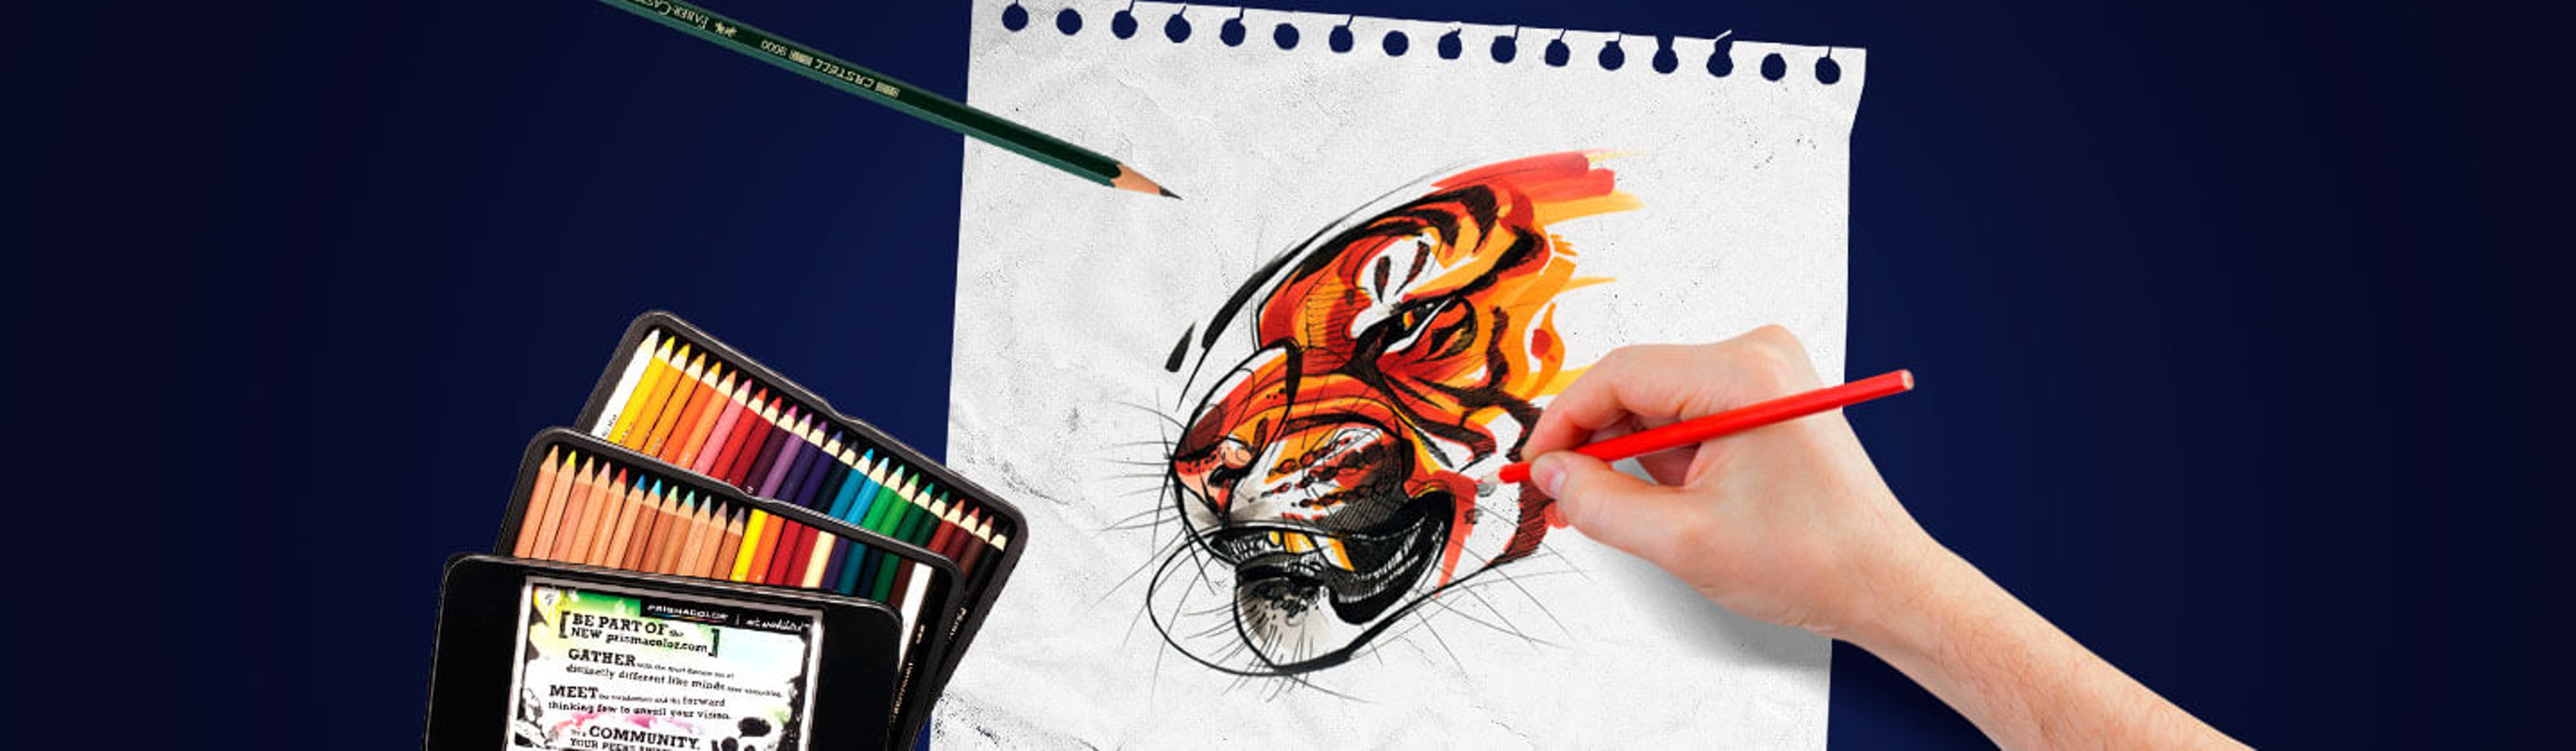 11 técnicas para dibujar a lápiz como un profesional